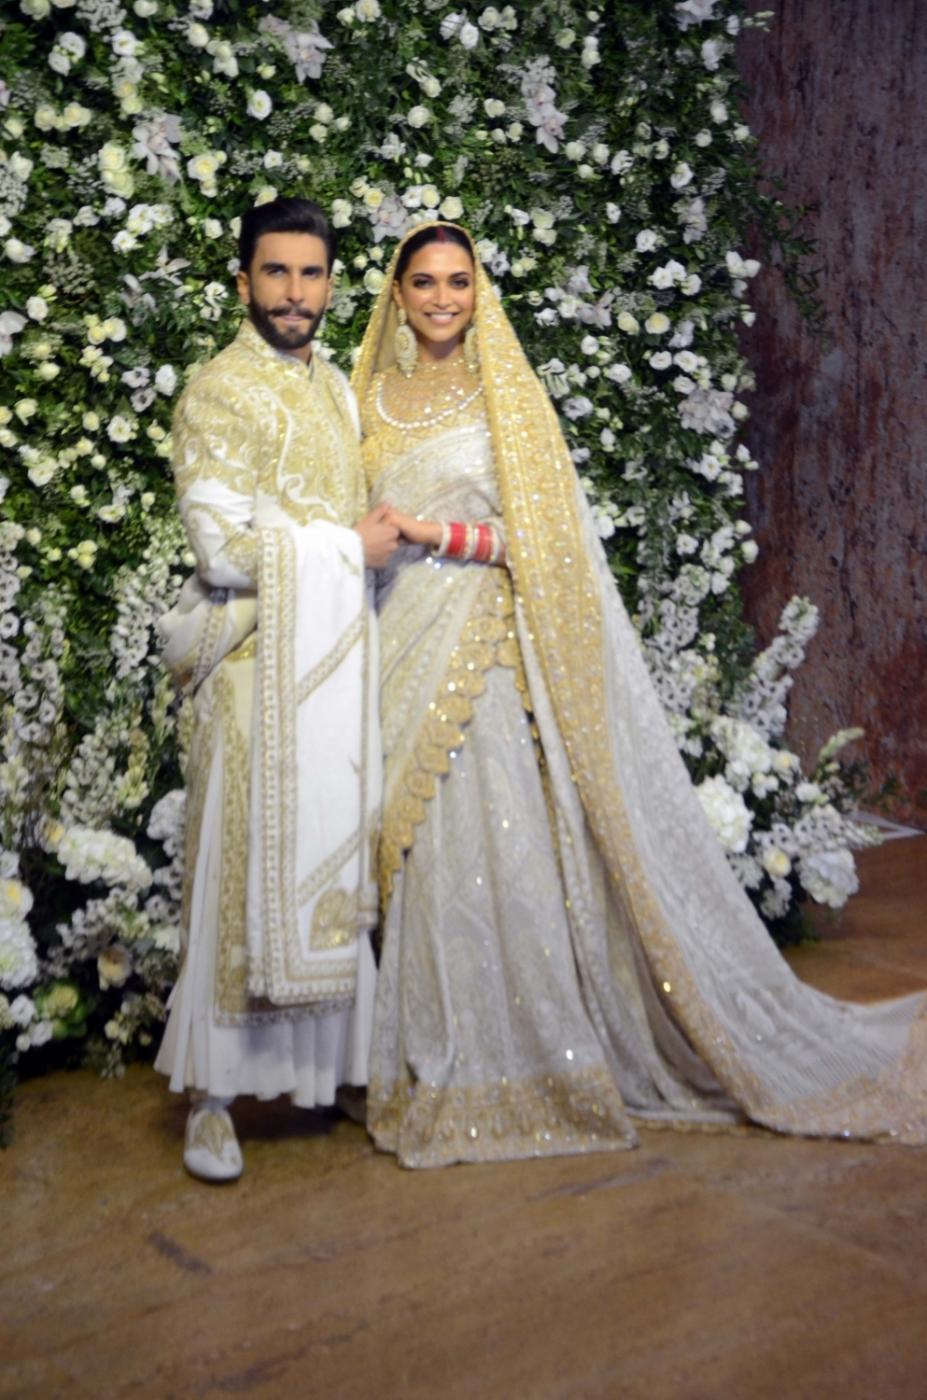 Mumbai: The newlywed actors Deepika Padukone and Ranveer Singh at their wedding reception at Grand Hyatt in Mumbai on Nov 28, 2018. (Photo: IANS) by .